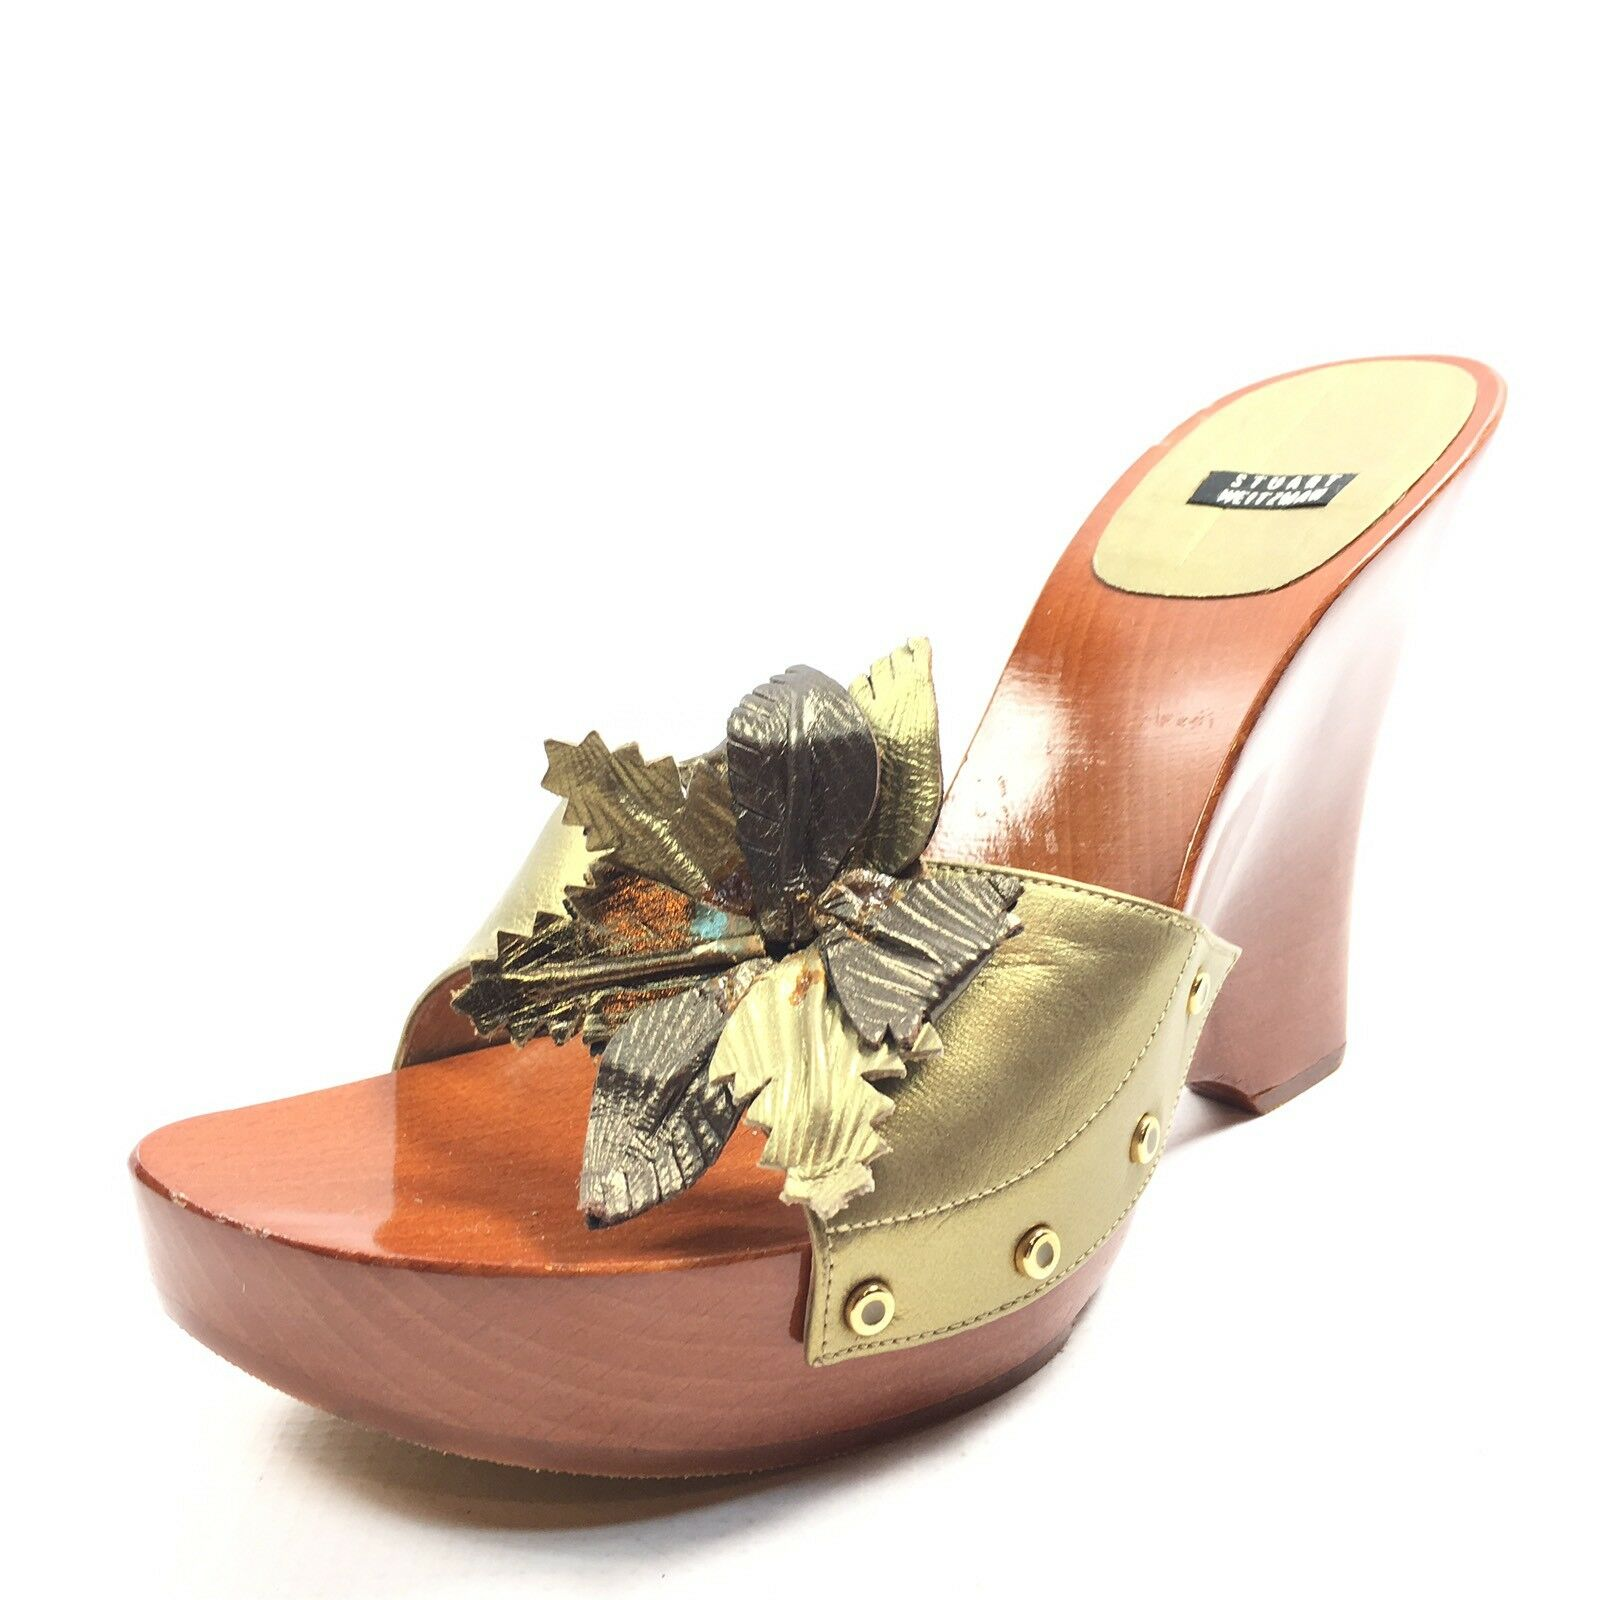 New Stuart Stuart Stuart Weitzman gold Leather Open Toe Platform Sandals Women's Size 8.5 M a2bcd3